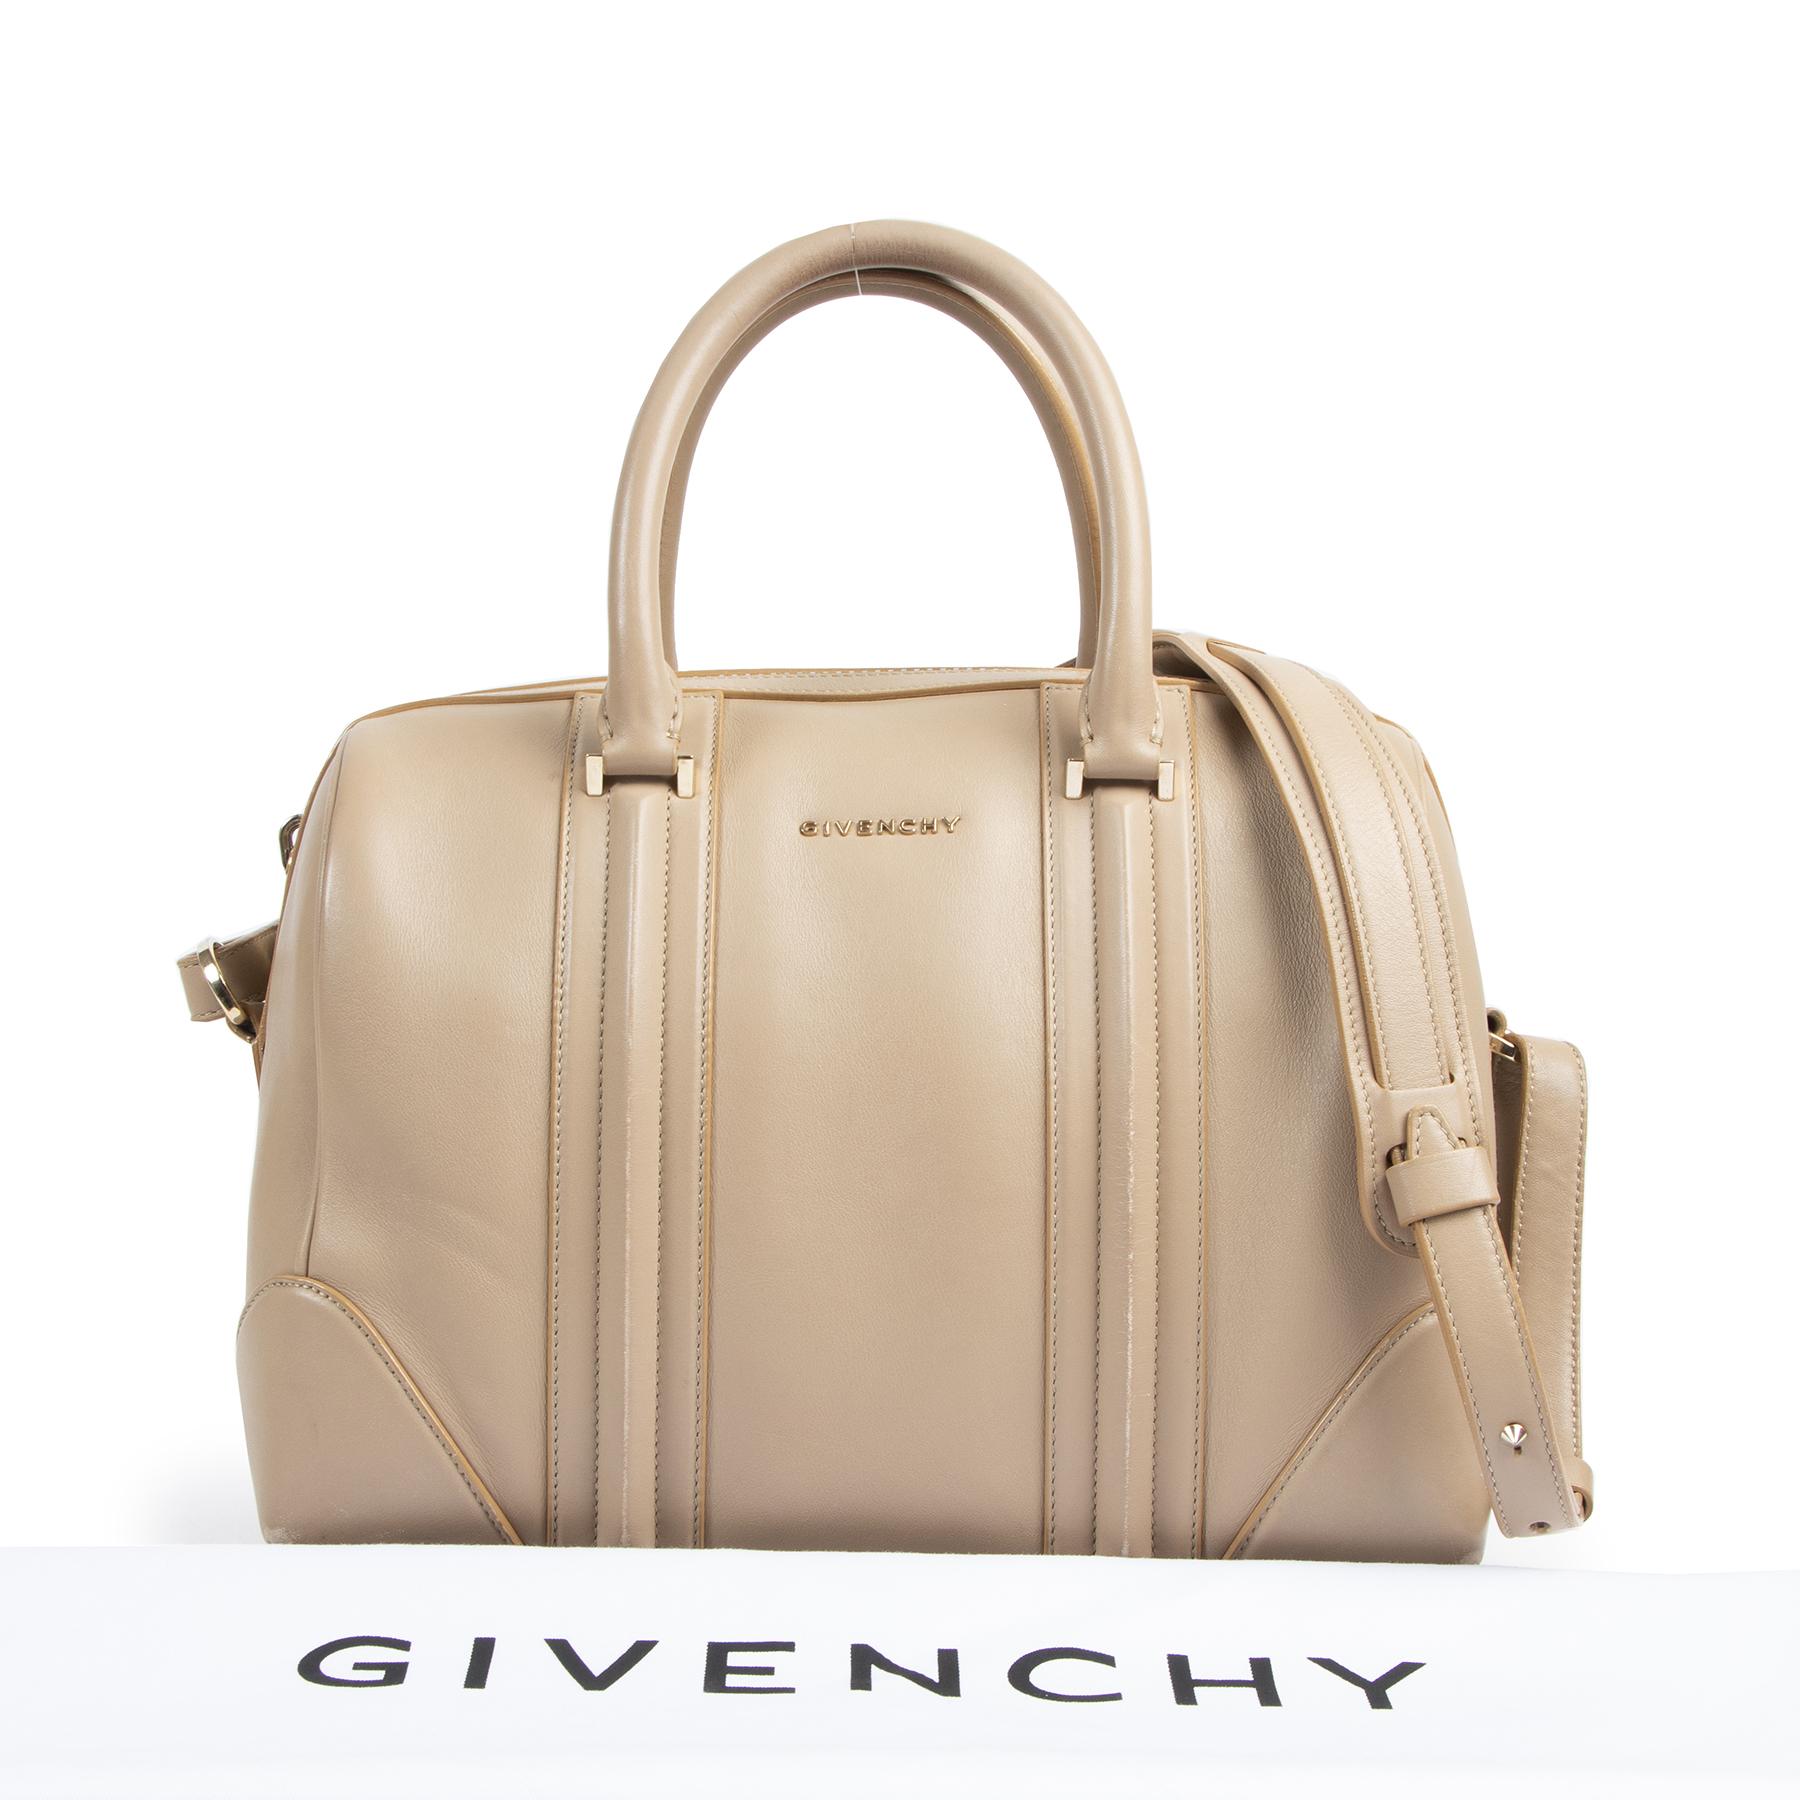 Authentic secondhand Givenchy bags designer luxury vintage webshop fashion safe secure online shopping designer brands